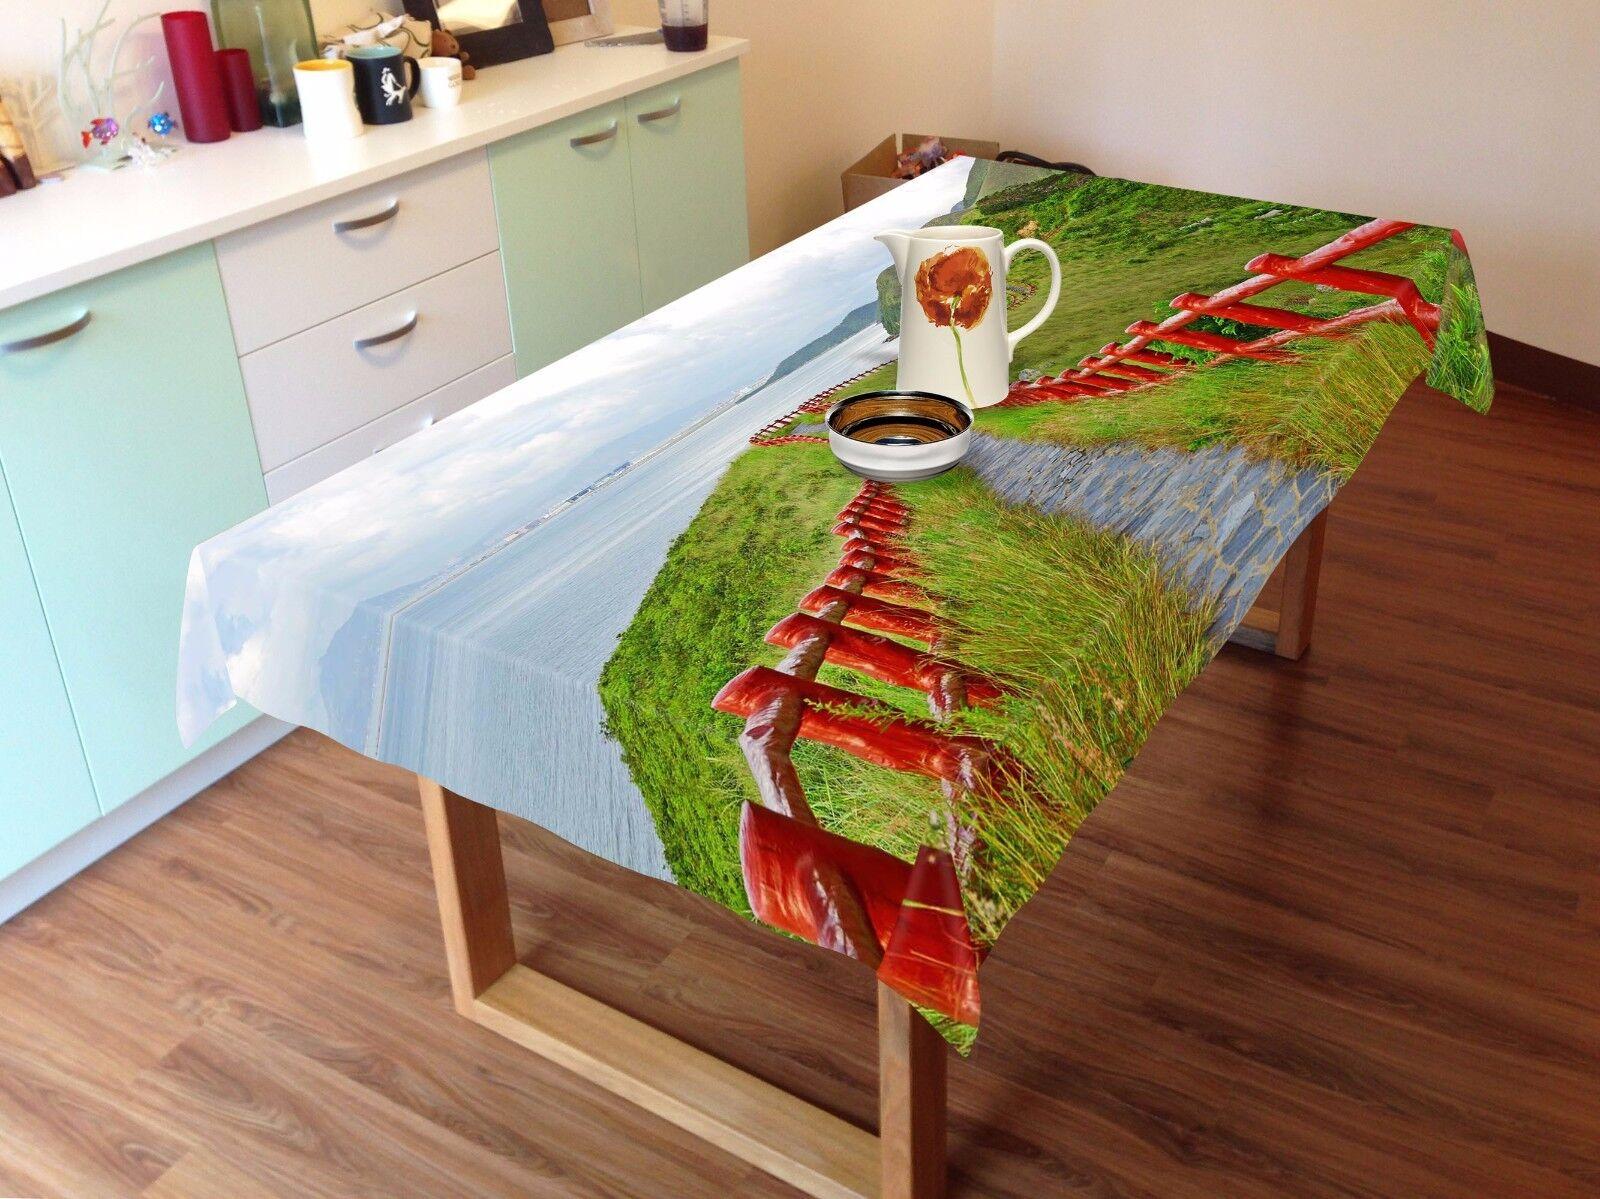 3D Lawn Sky Tablecloth Table Cover Cloth Birthday Party AJ WALLPAPER UK Lemon